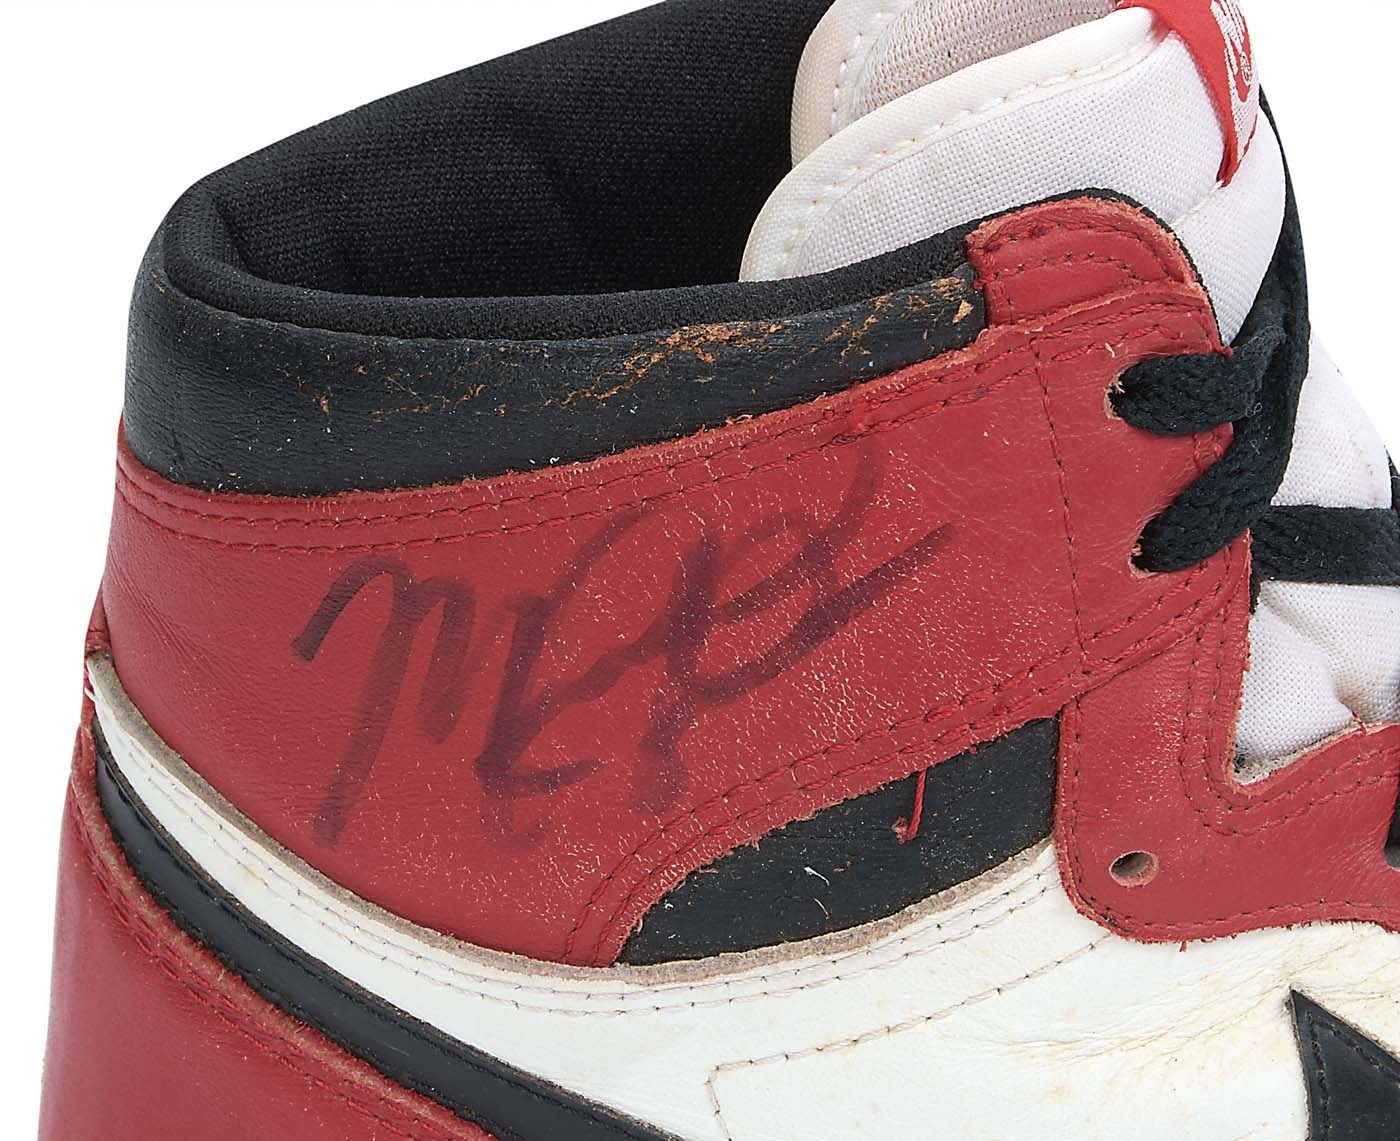 828b1ef6fa0993 Bulls Michael Jordan Signed 1985 Original Air Jordan I Sneakers JSA ...